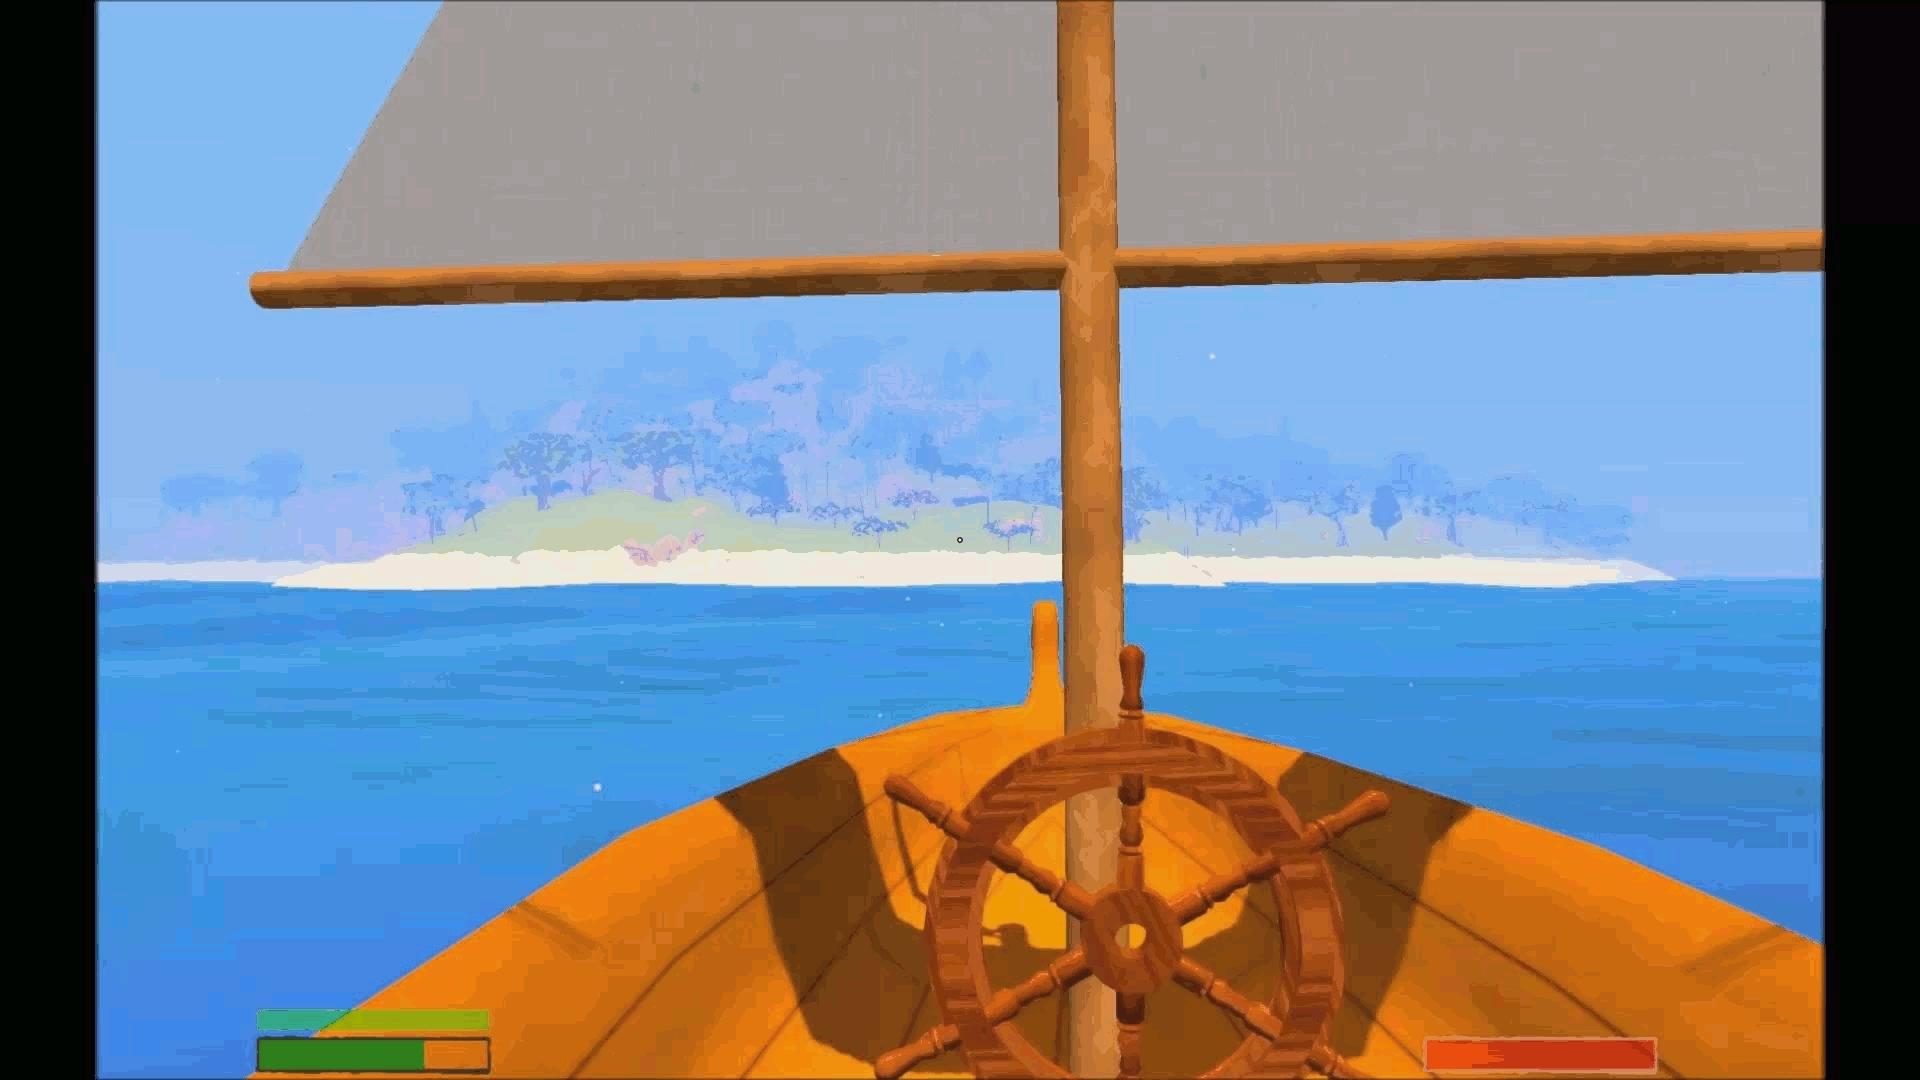 indiegaming, Salt Sailing GIFs